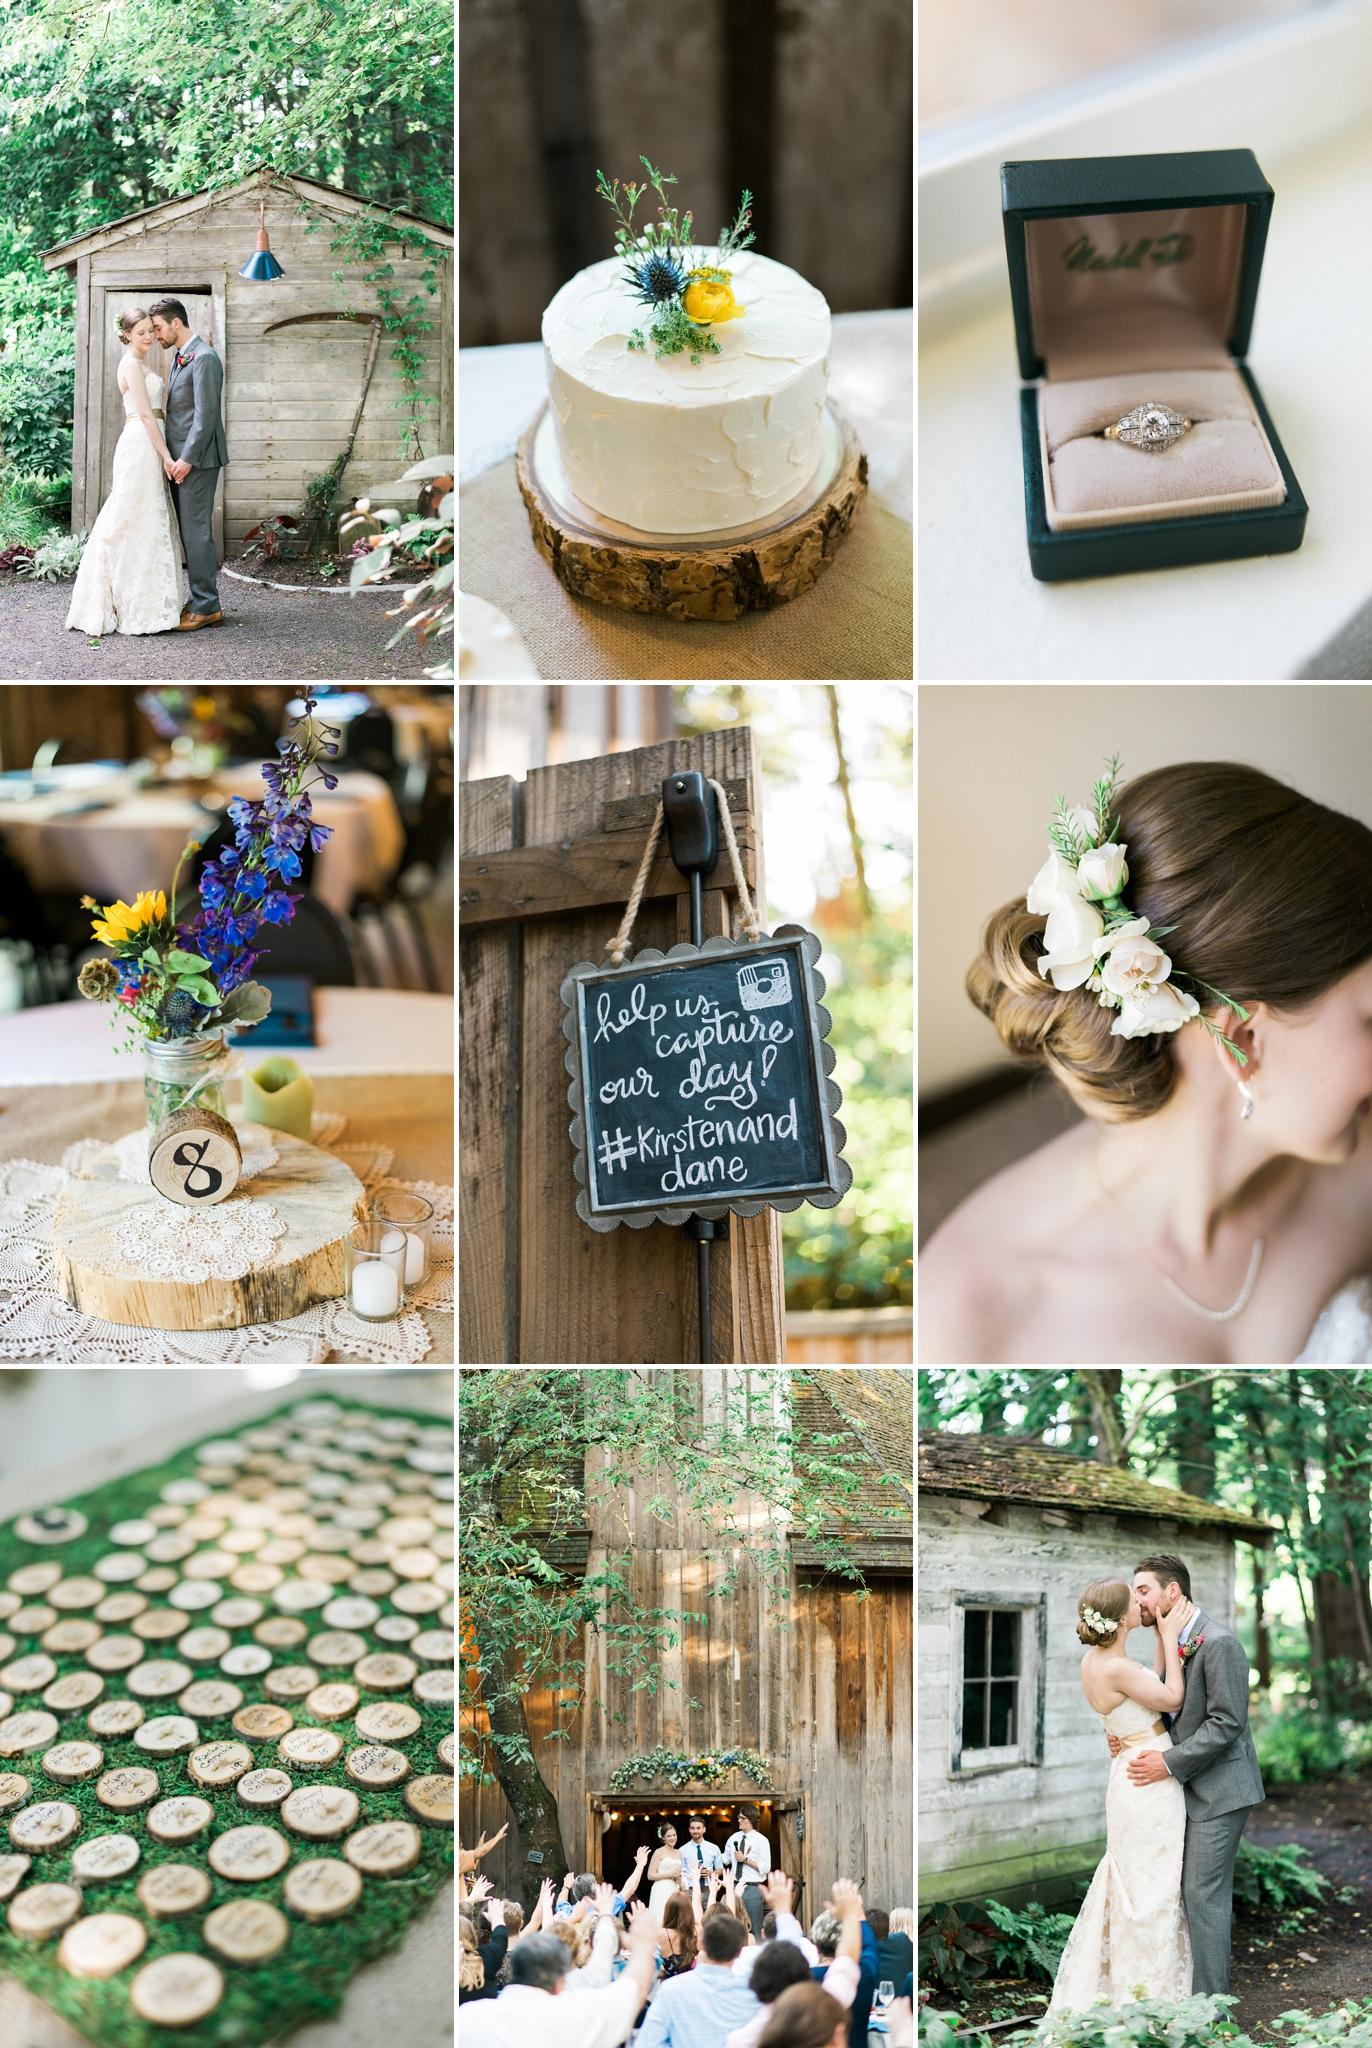 mcmenamins-cornelius-pass-roadhouse-wedding-beaverton-oregon-rustic-chic-shelley-marie-photo